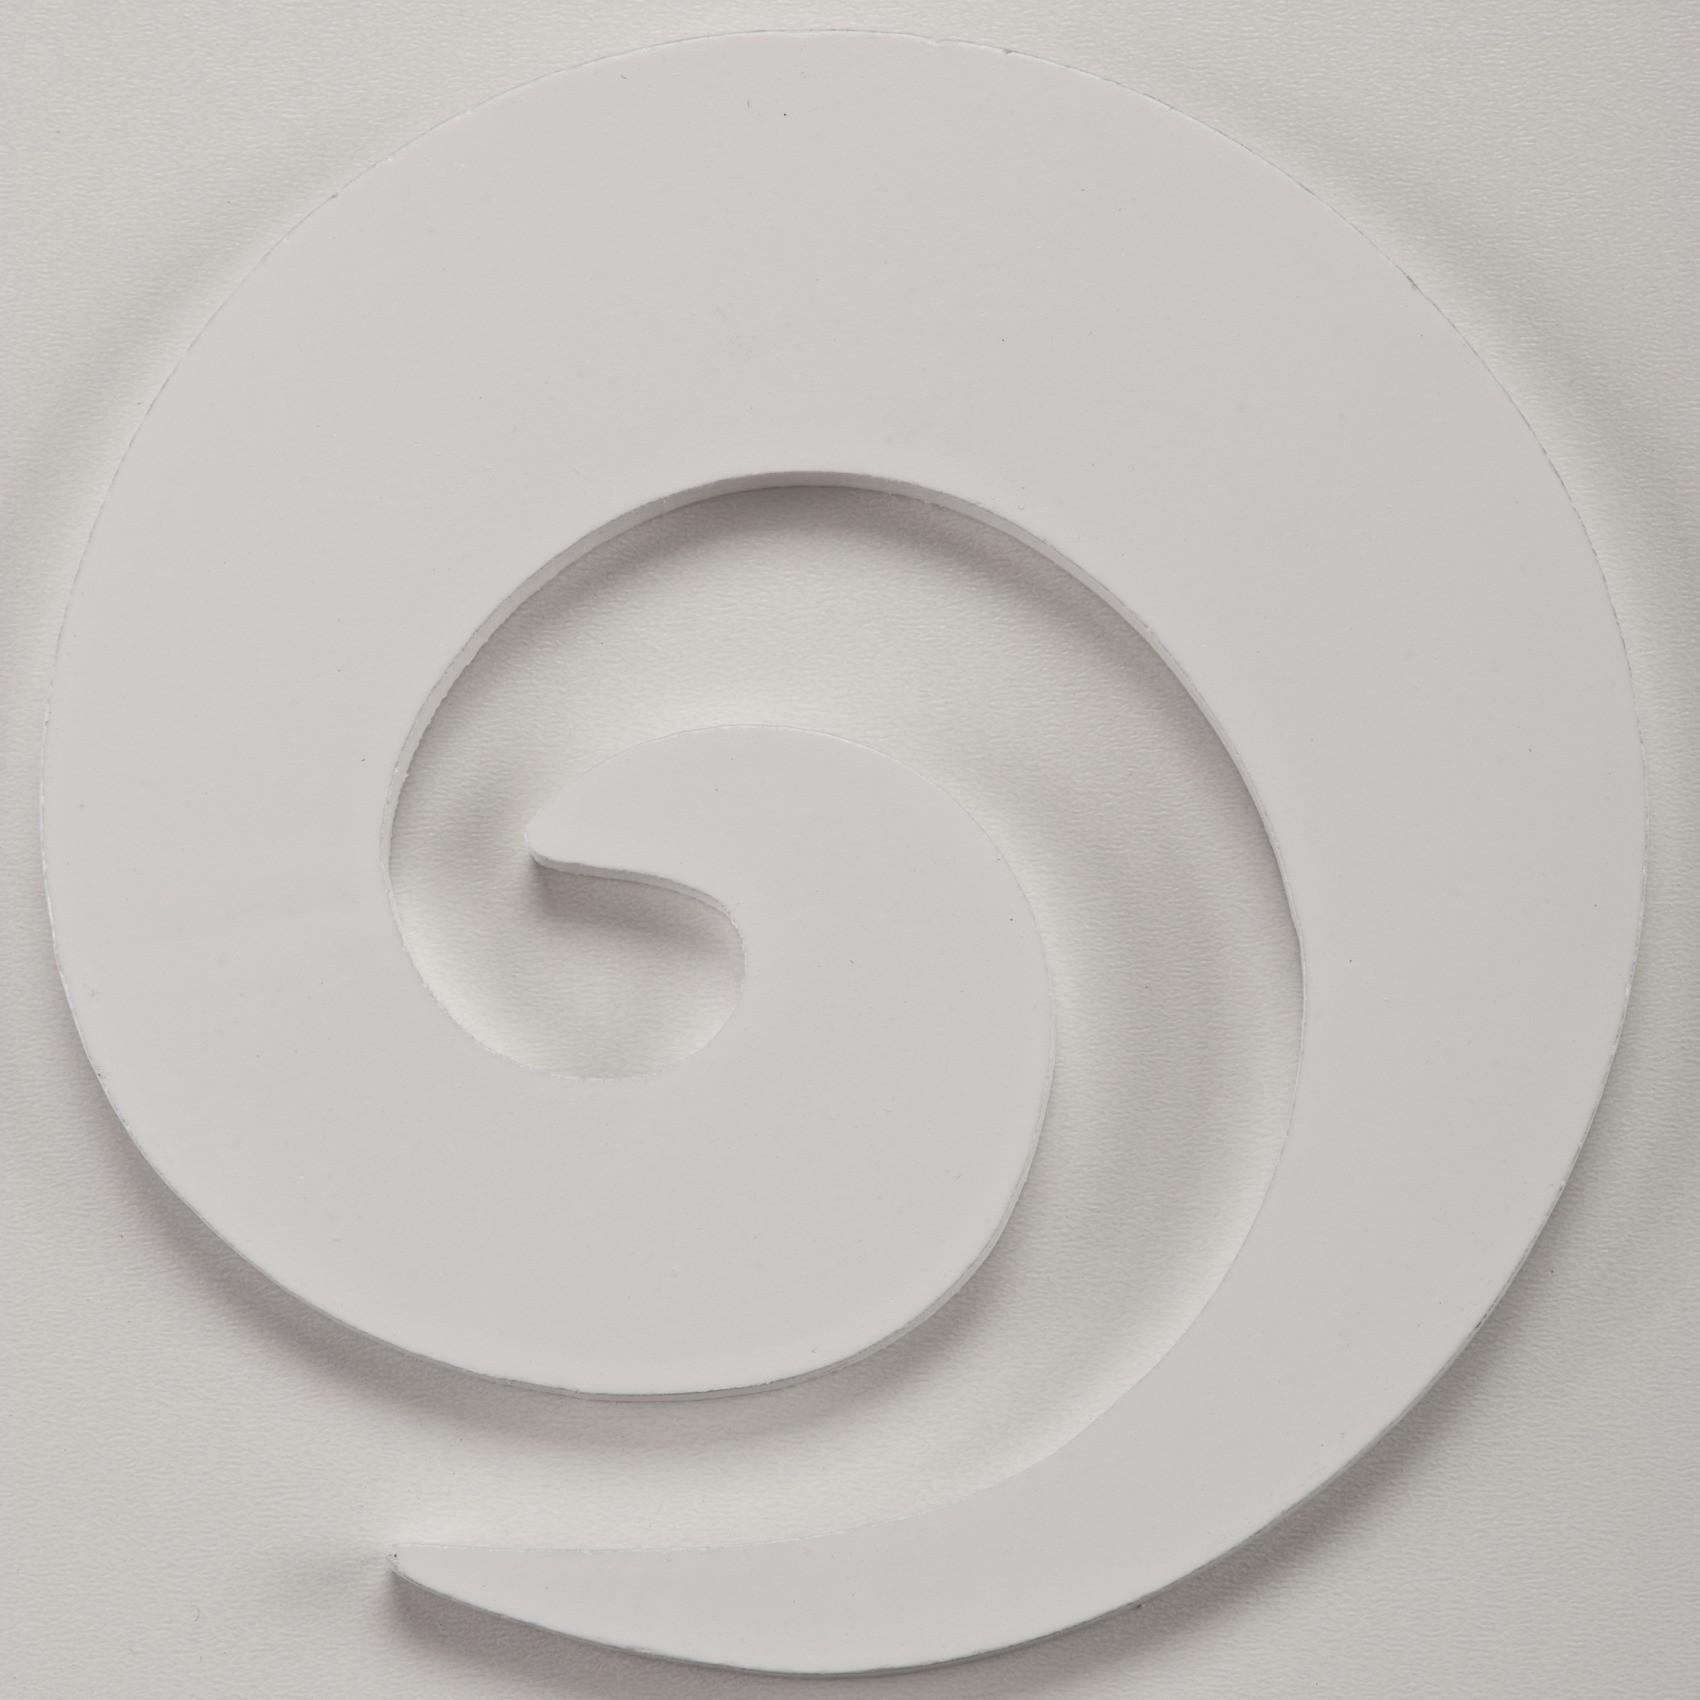 SLIMAK DEKOR 4276 - Biały